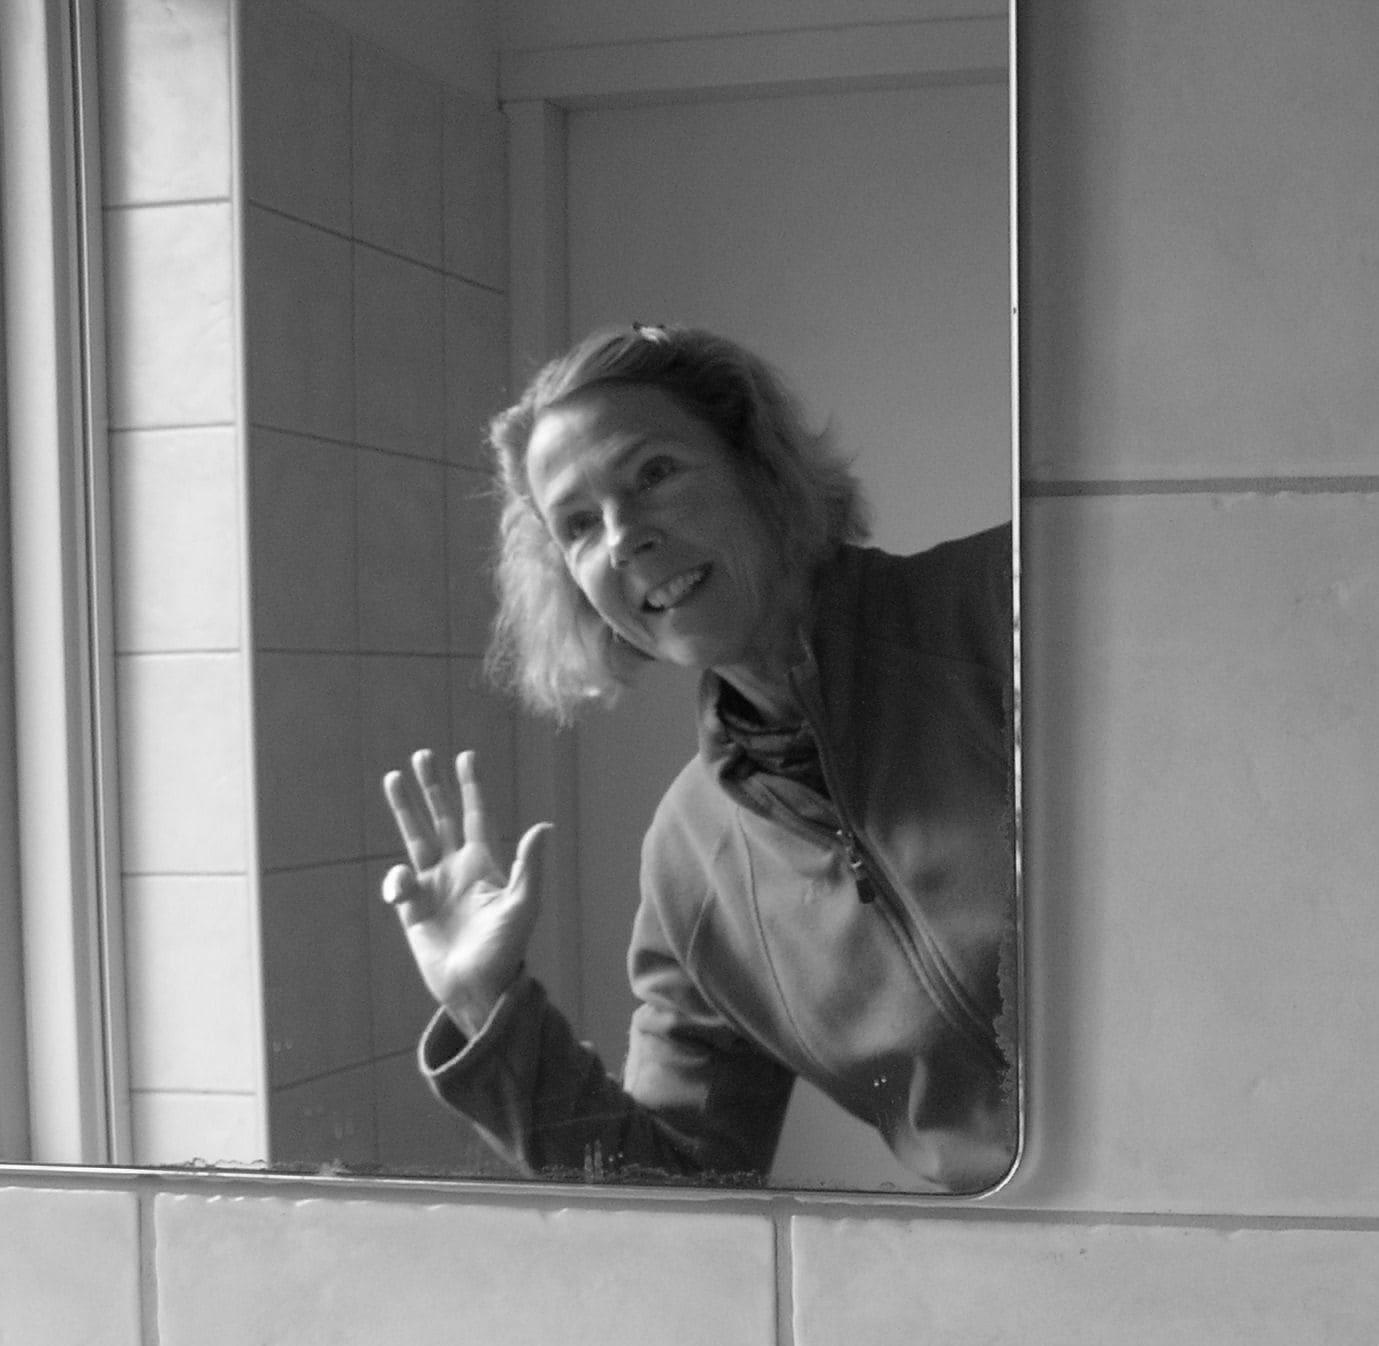 RdH-Selfie-02-OI.jpg